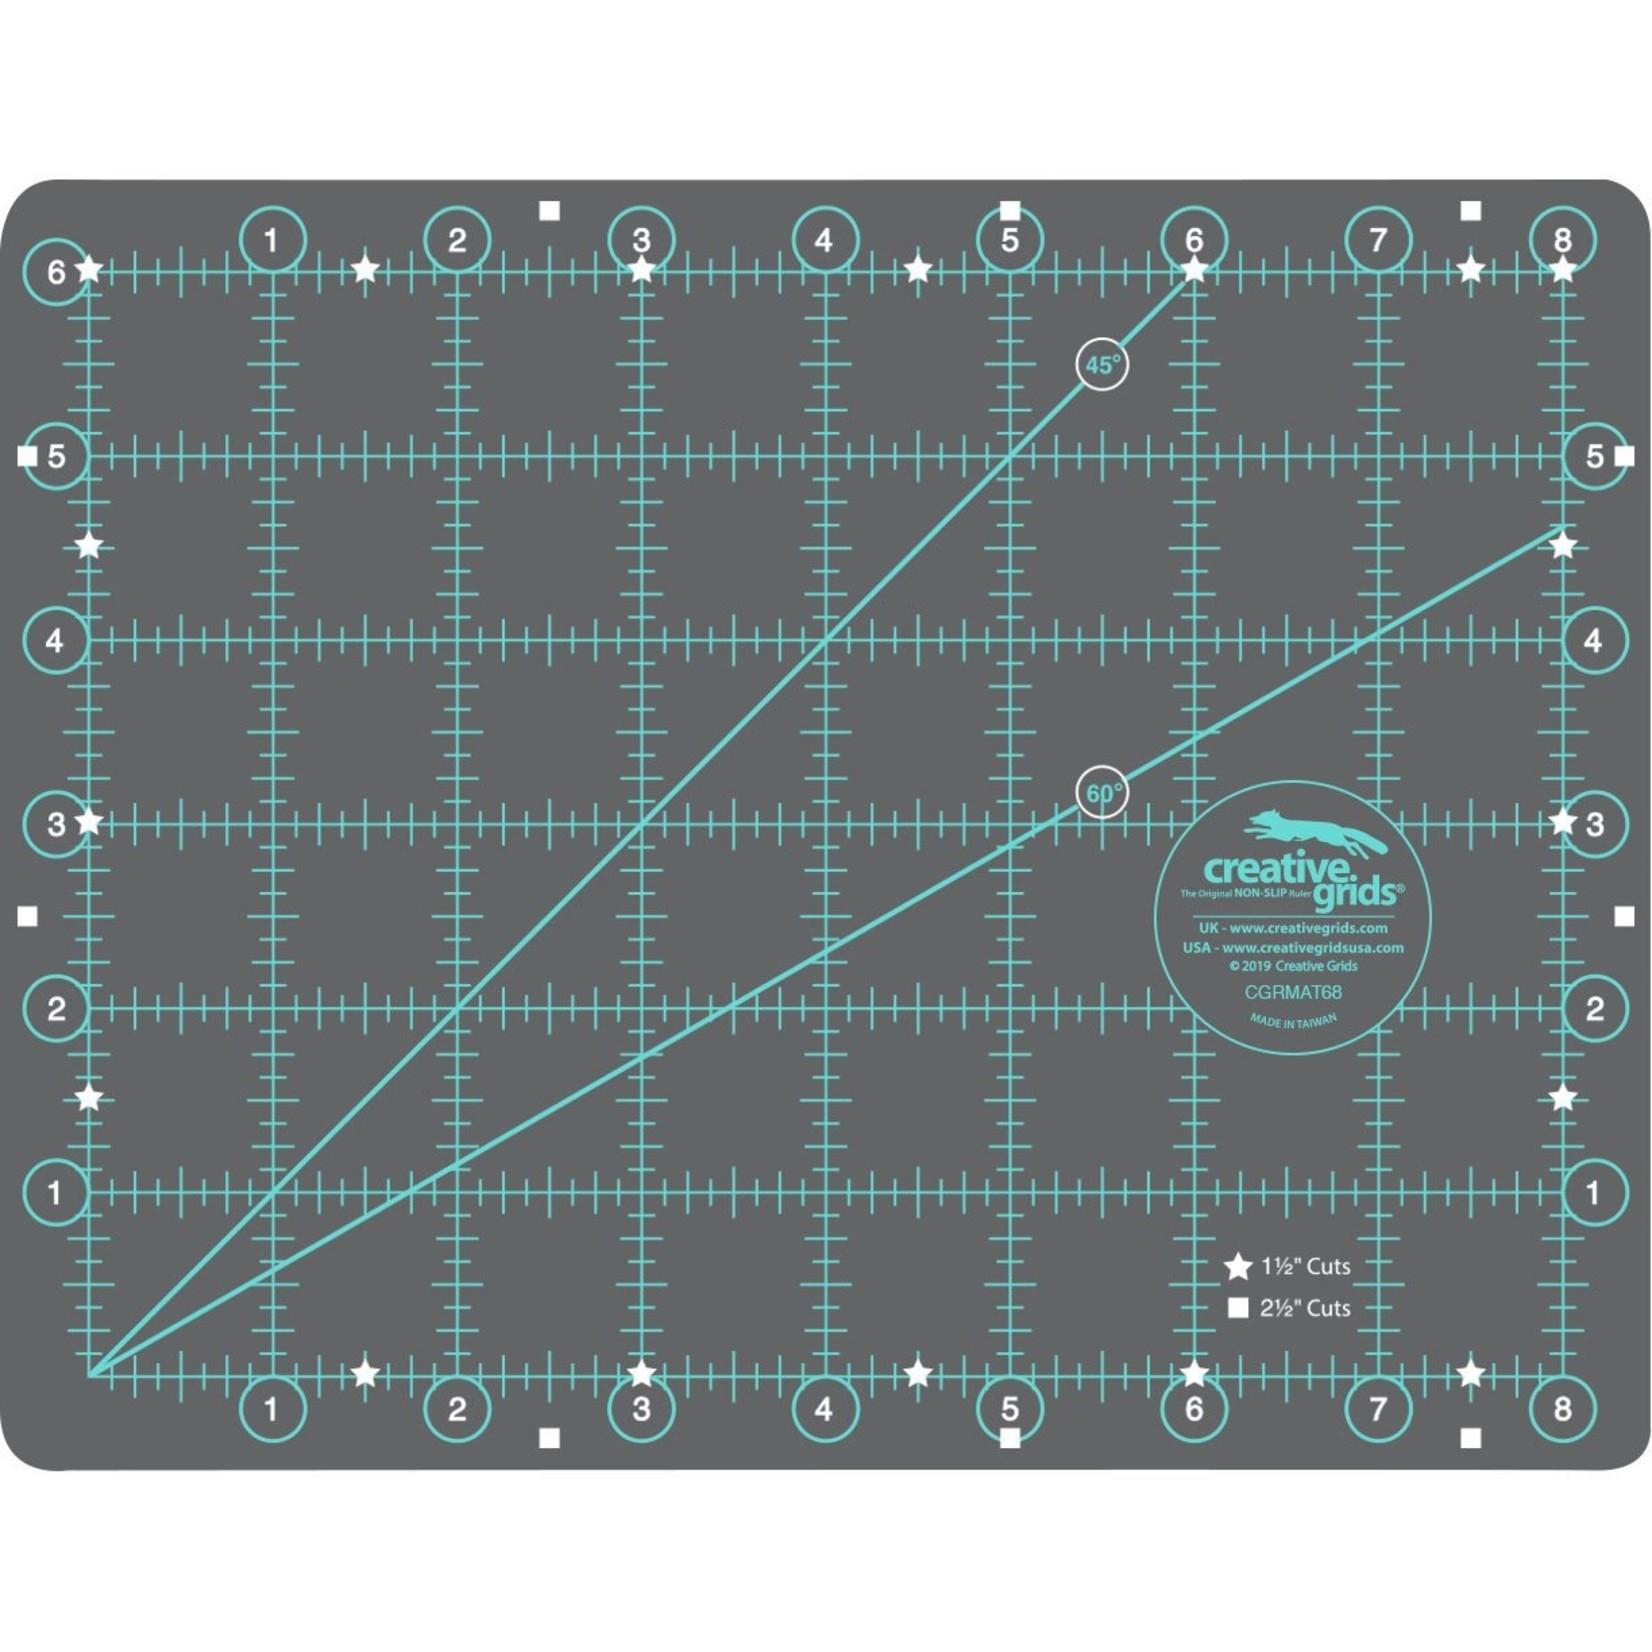 "Creative Grids Creative Grids 6"" x 8"" Mat CGRMAT68"